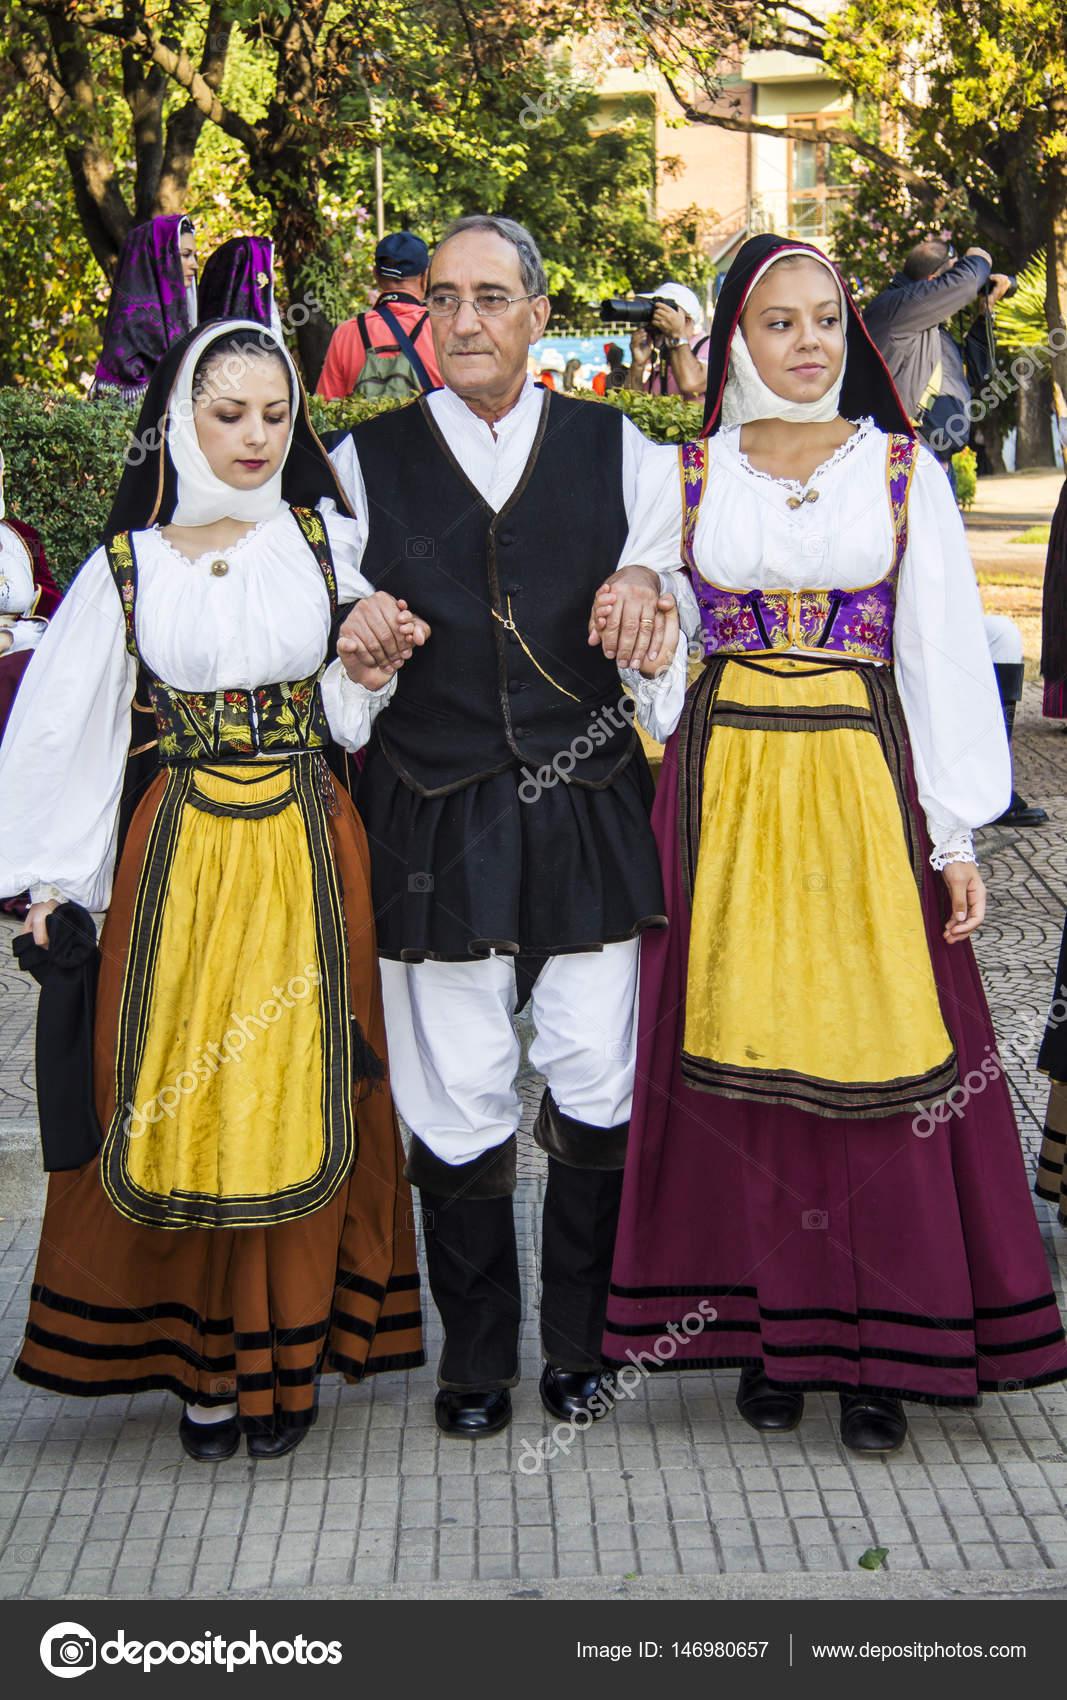 © — Gianfr Editoriale atzei Stock Sfilata In Foto Costume Sardo qZ7nwU0